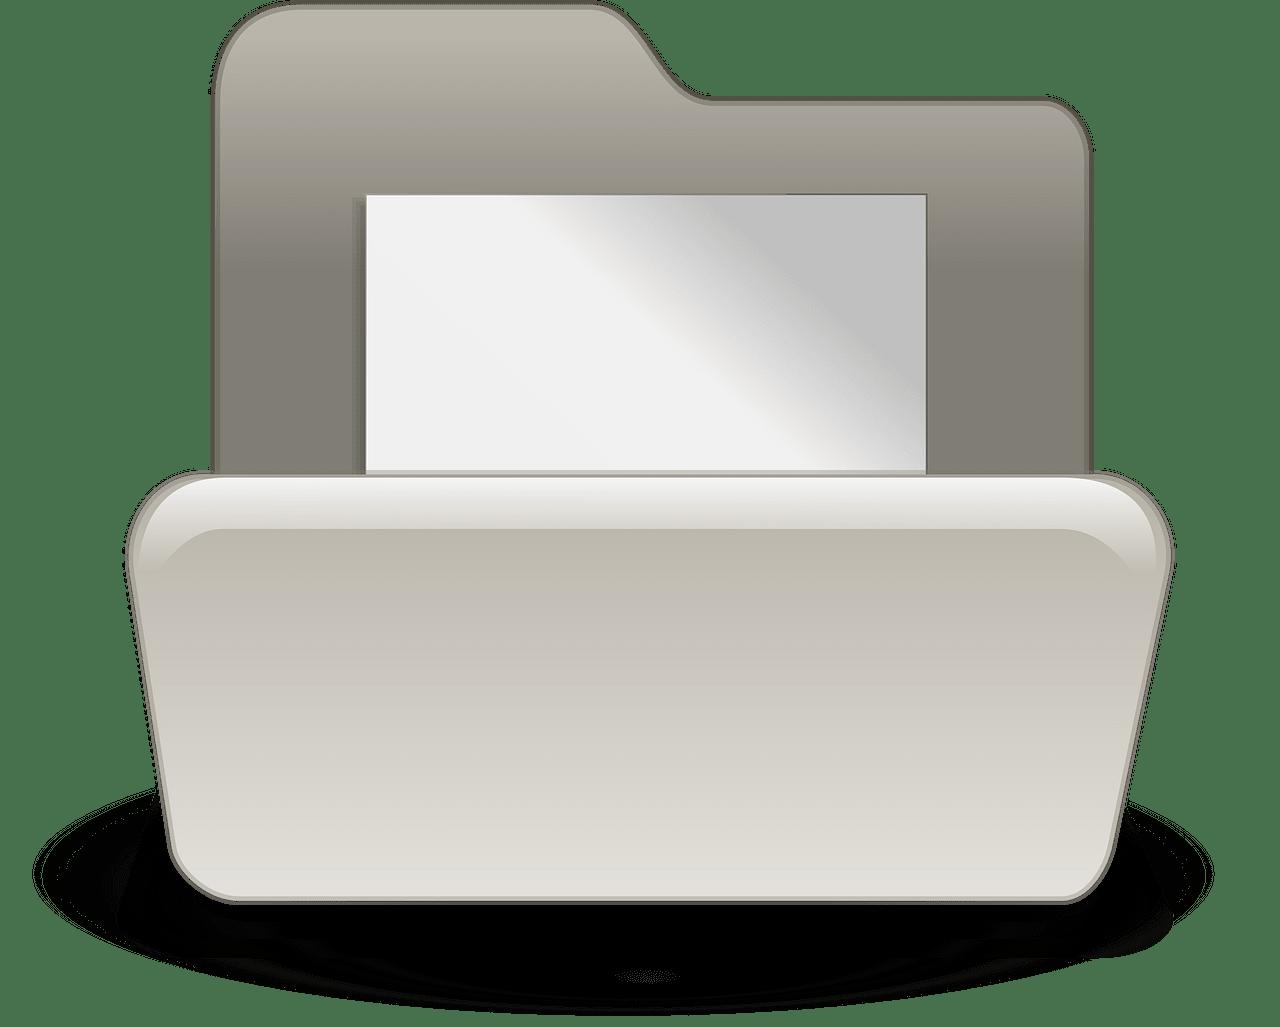 Folder clipart transparent 4